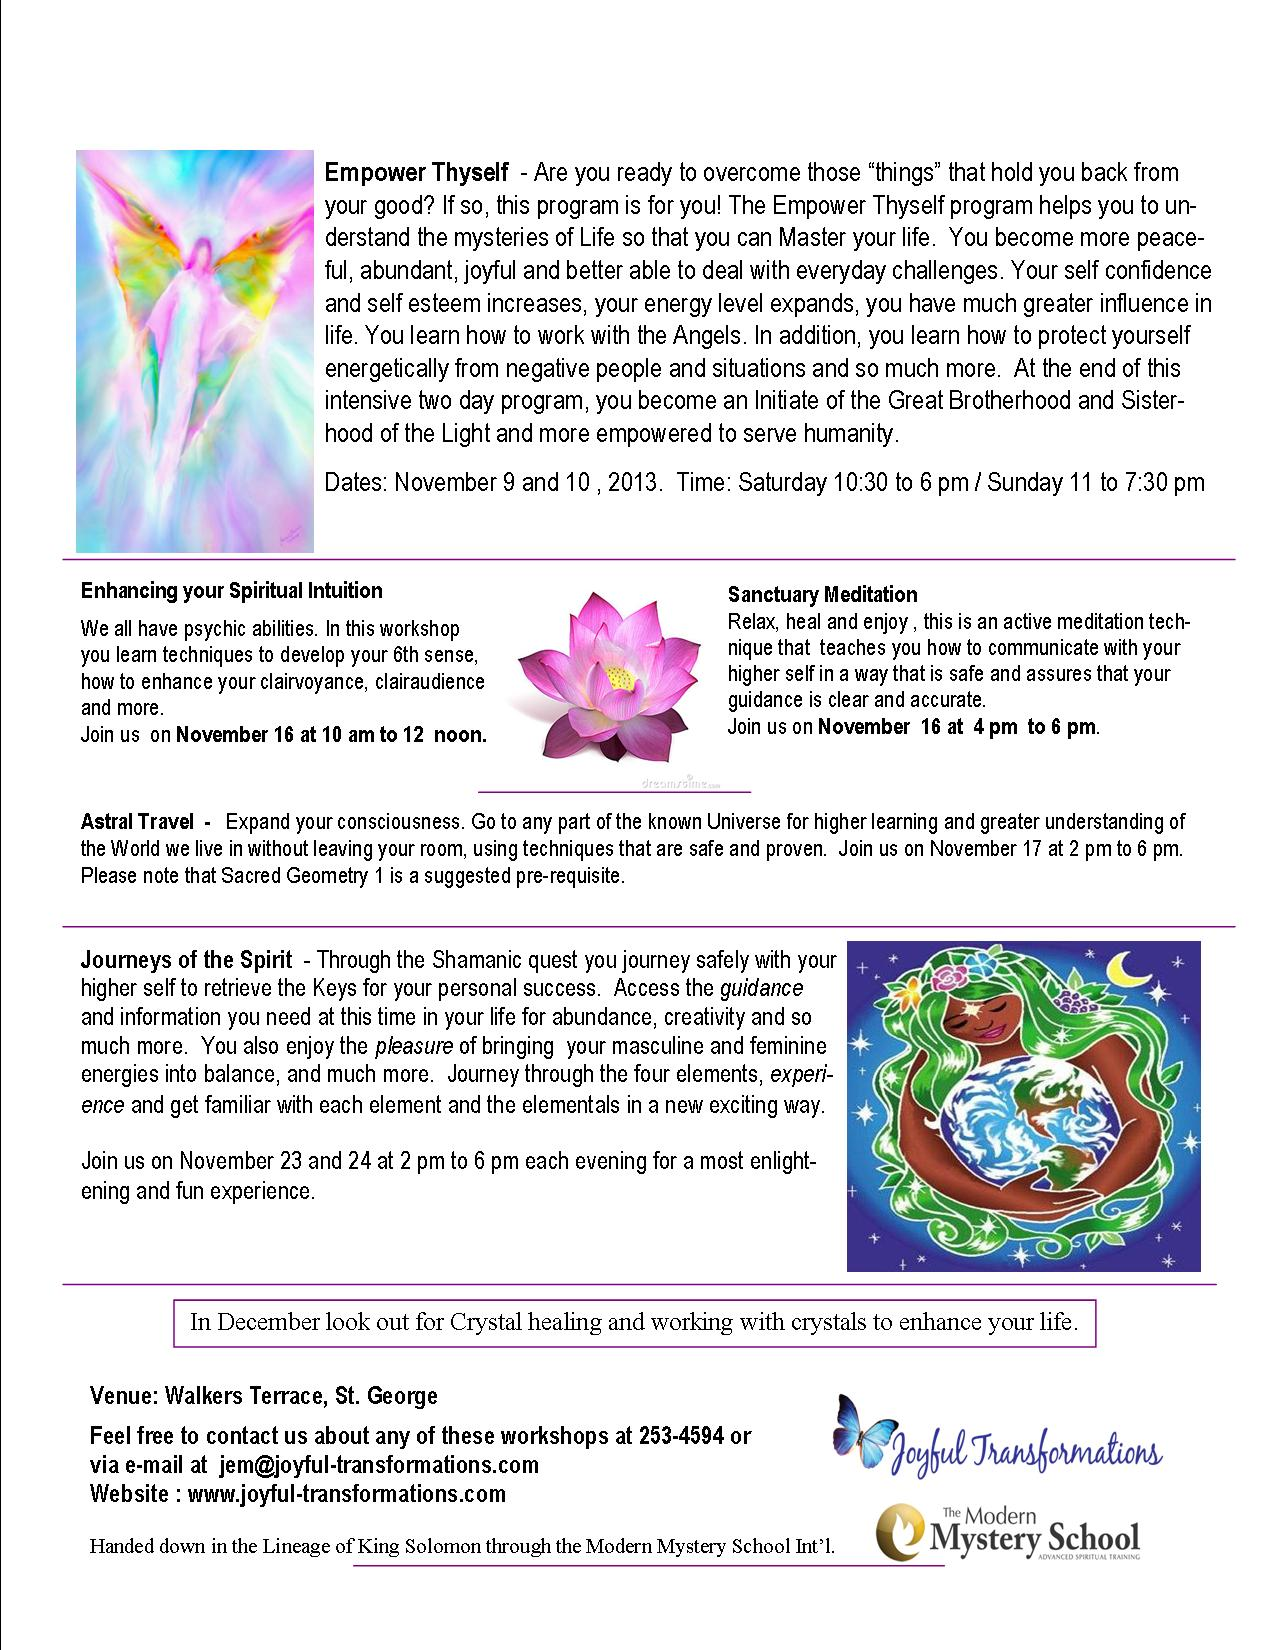 Empower Thyself and November Workshops